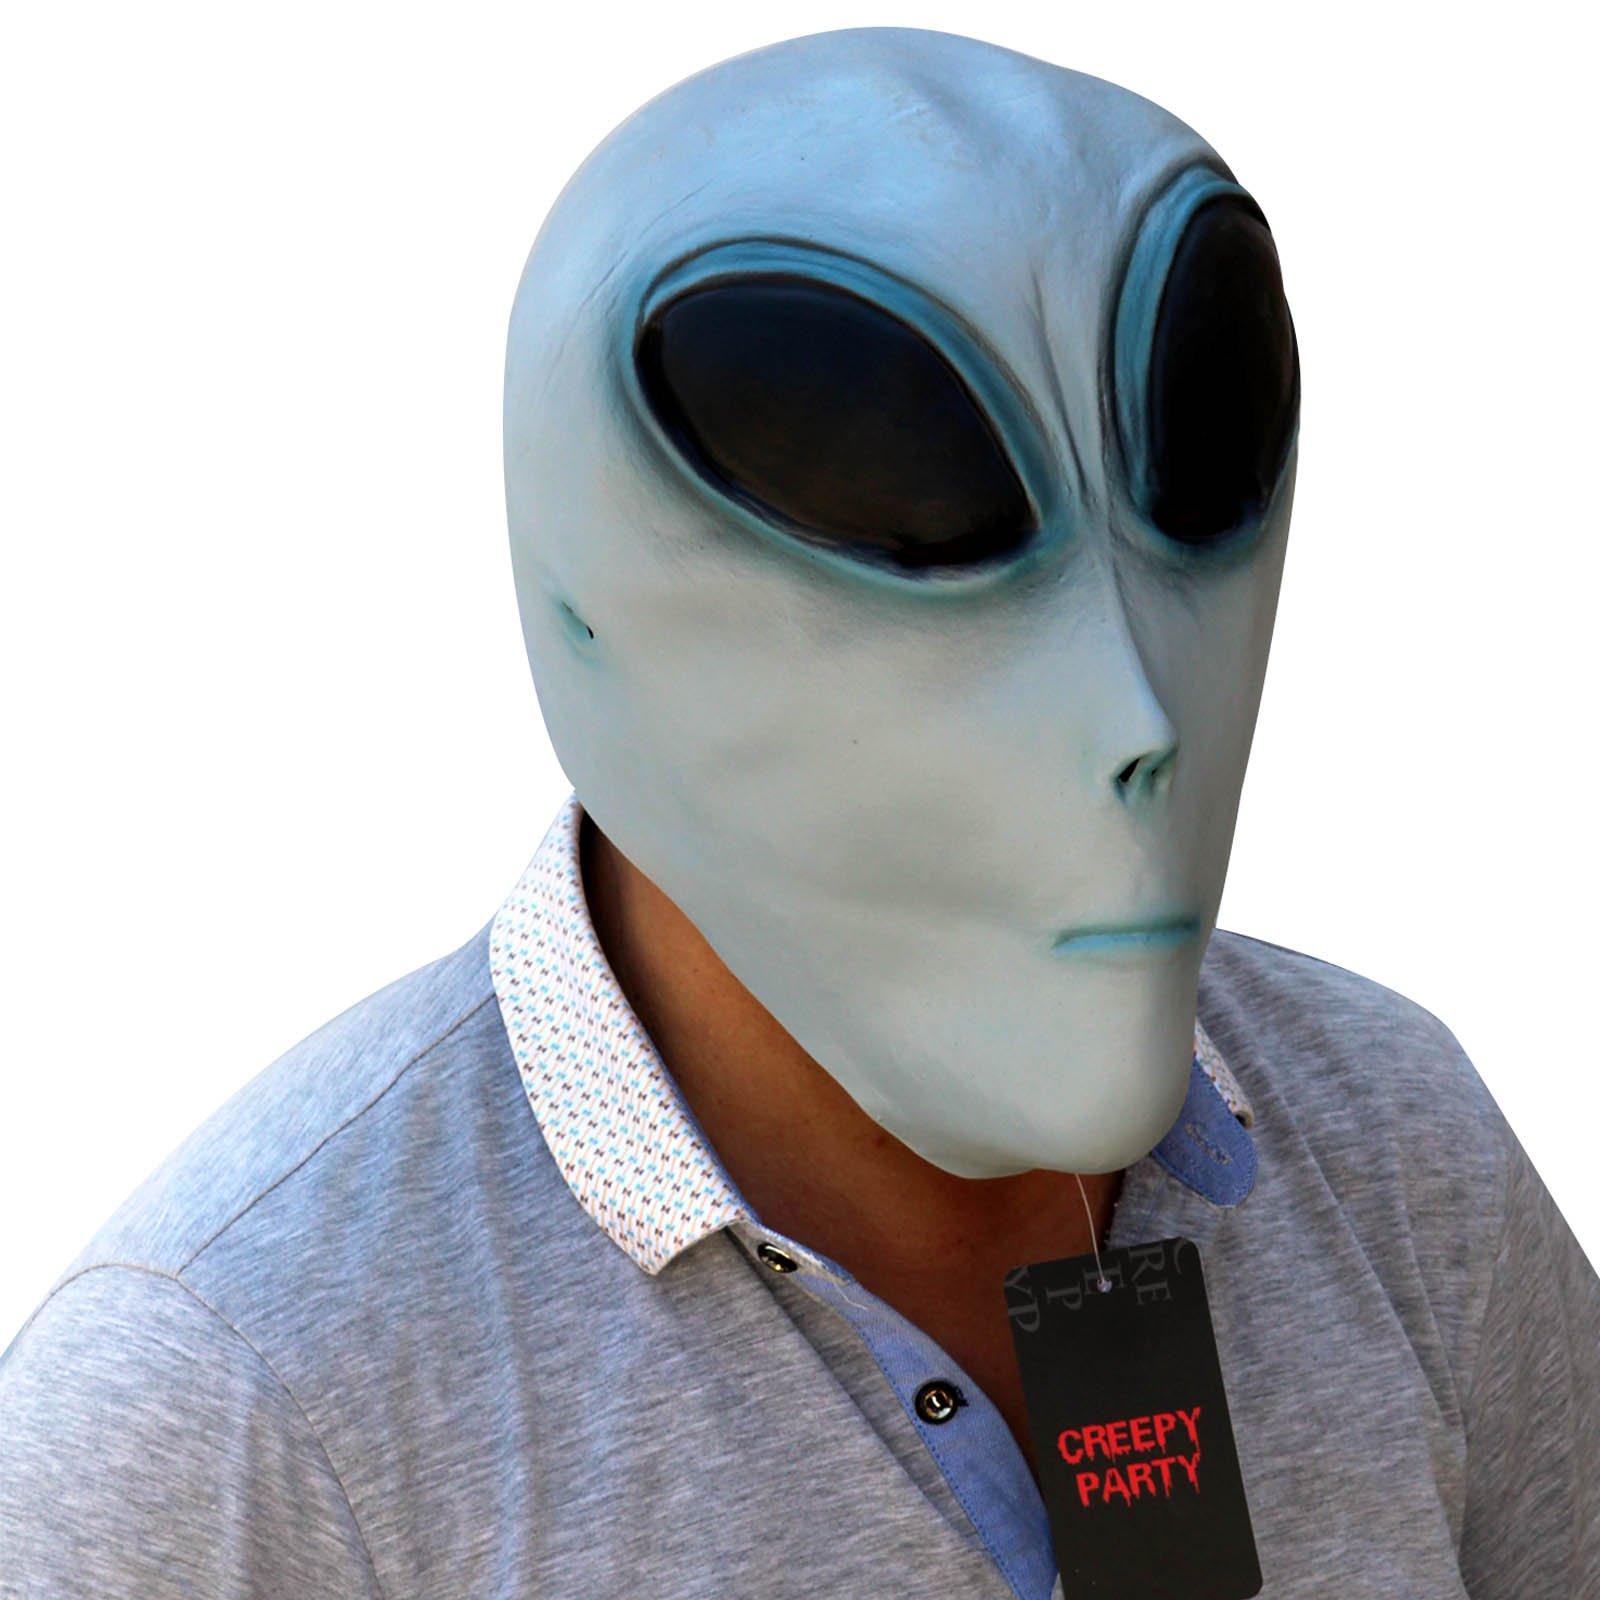 CreepyParty Deluxe Novelty Latex Halloween Mask Full Head Mask Alien by CreepyParty